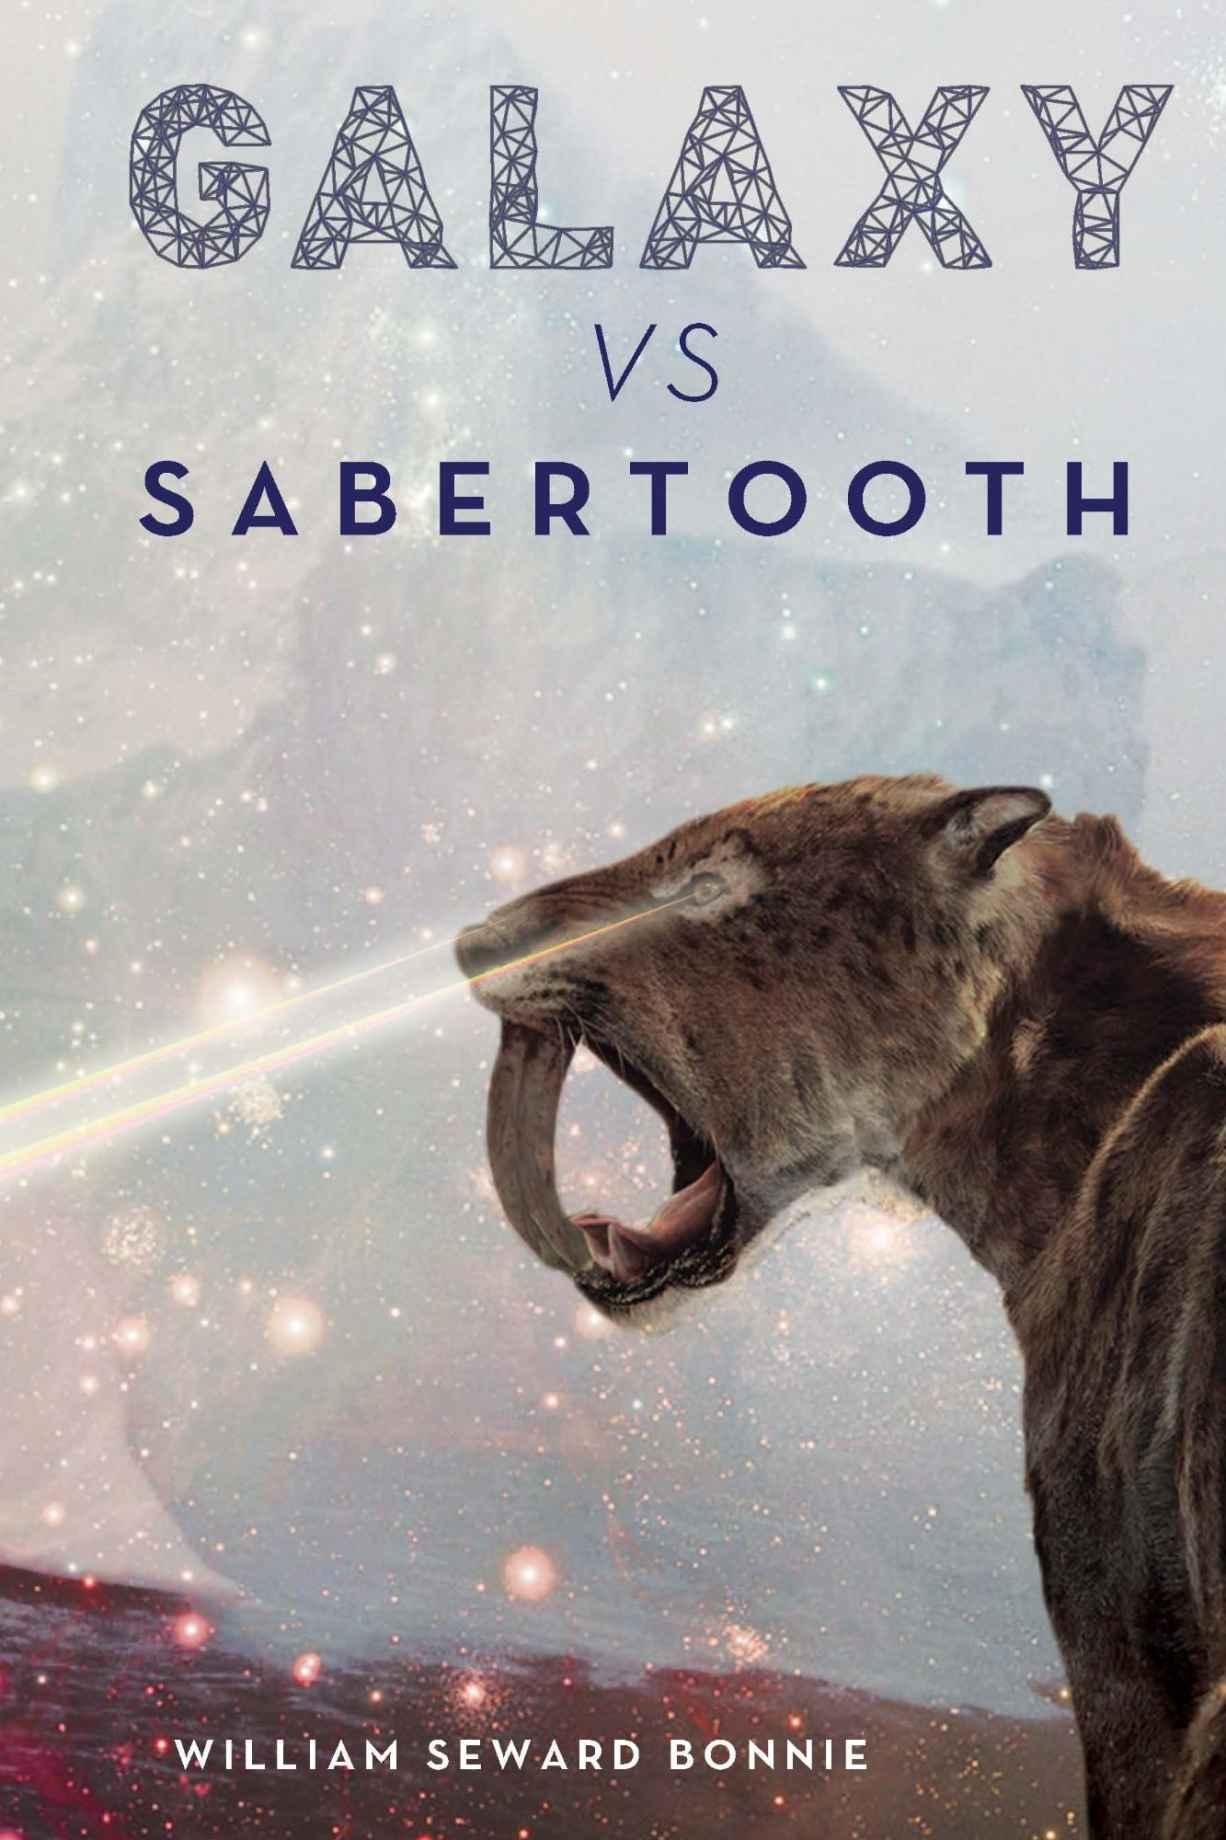 Galaxy Vs. Sabertooth